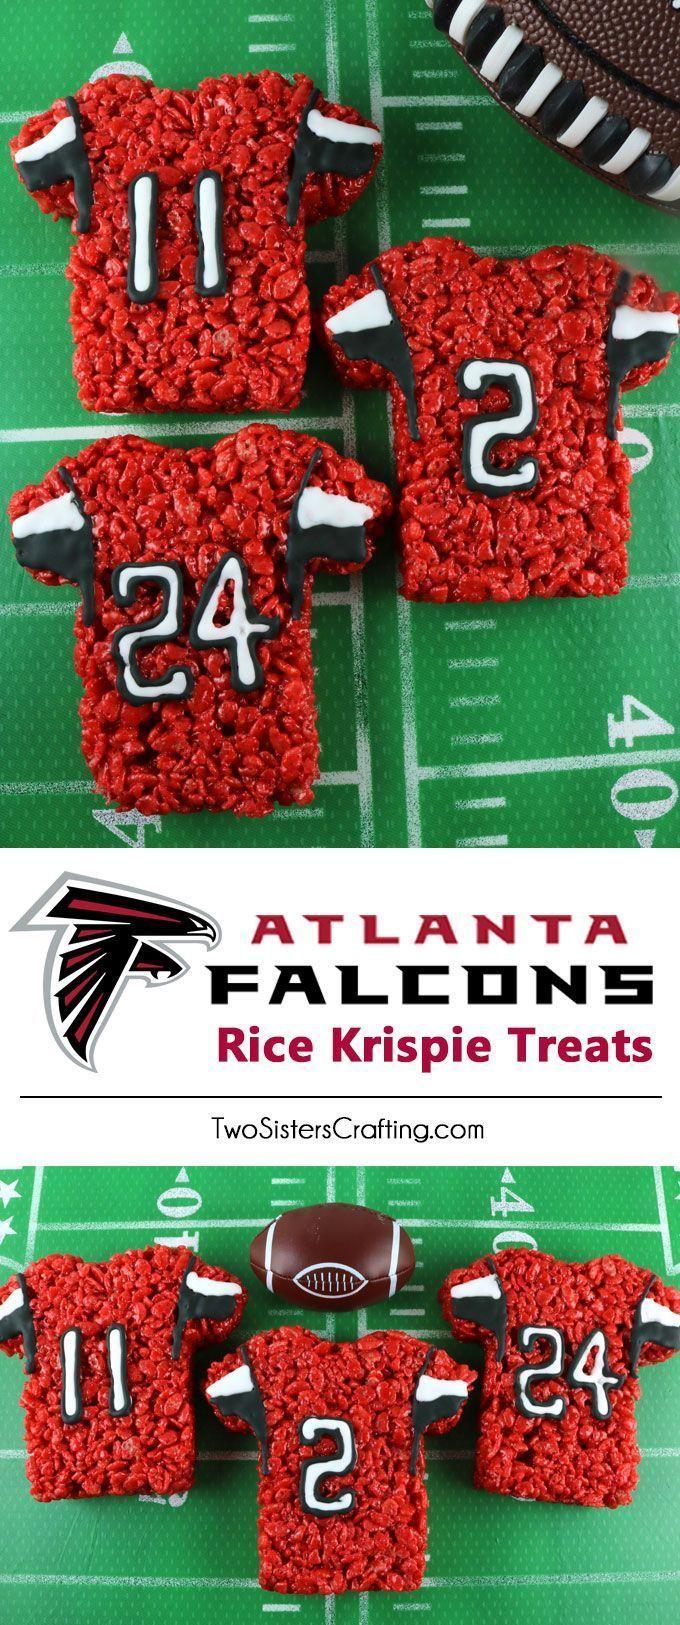 Atlanta Falcons Rice Krispie Treats Superbowl desserts